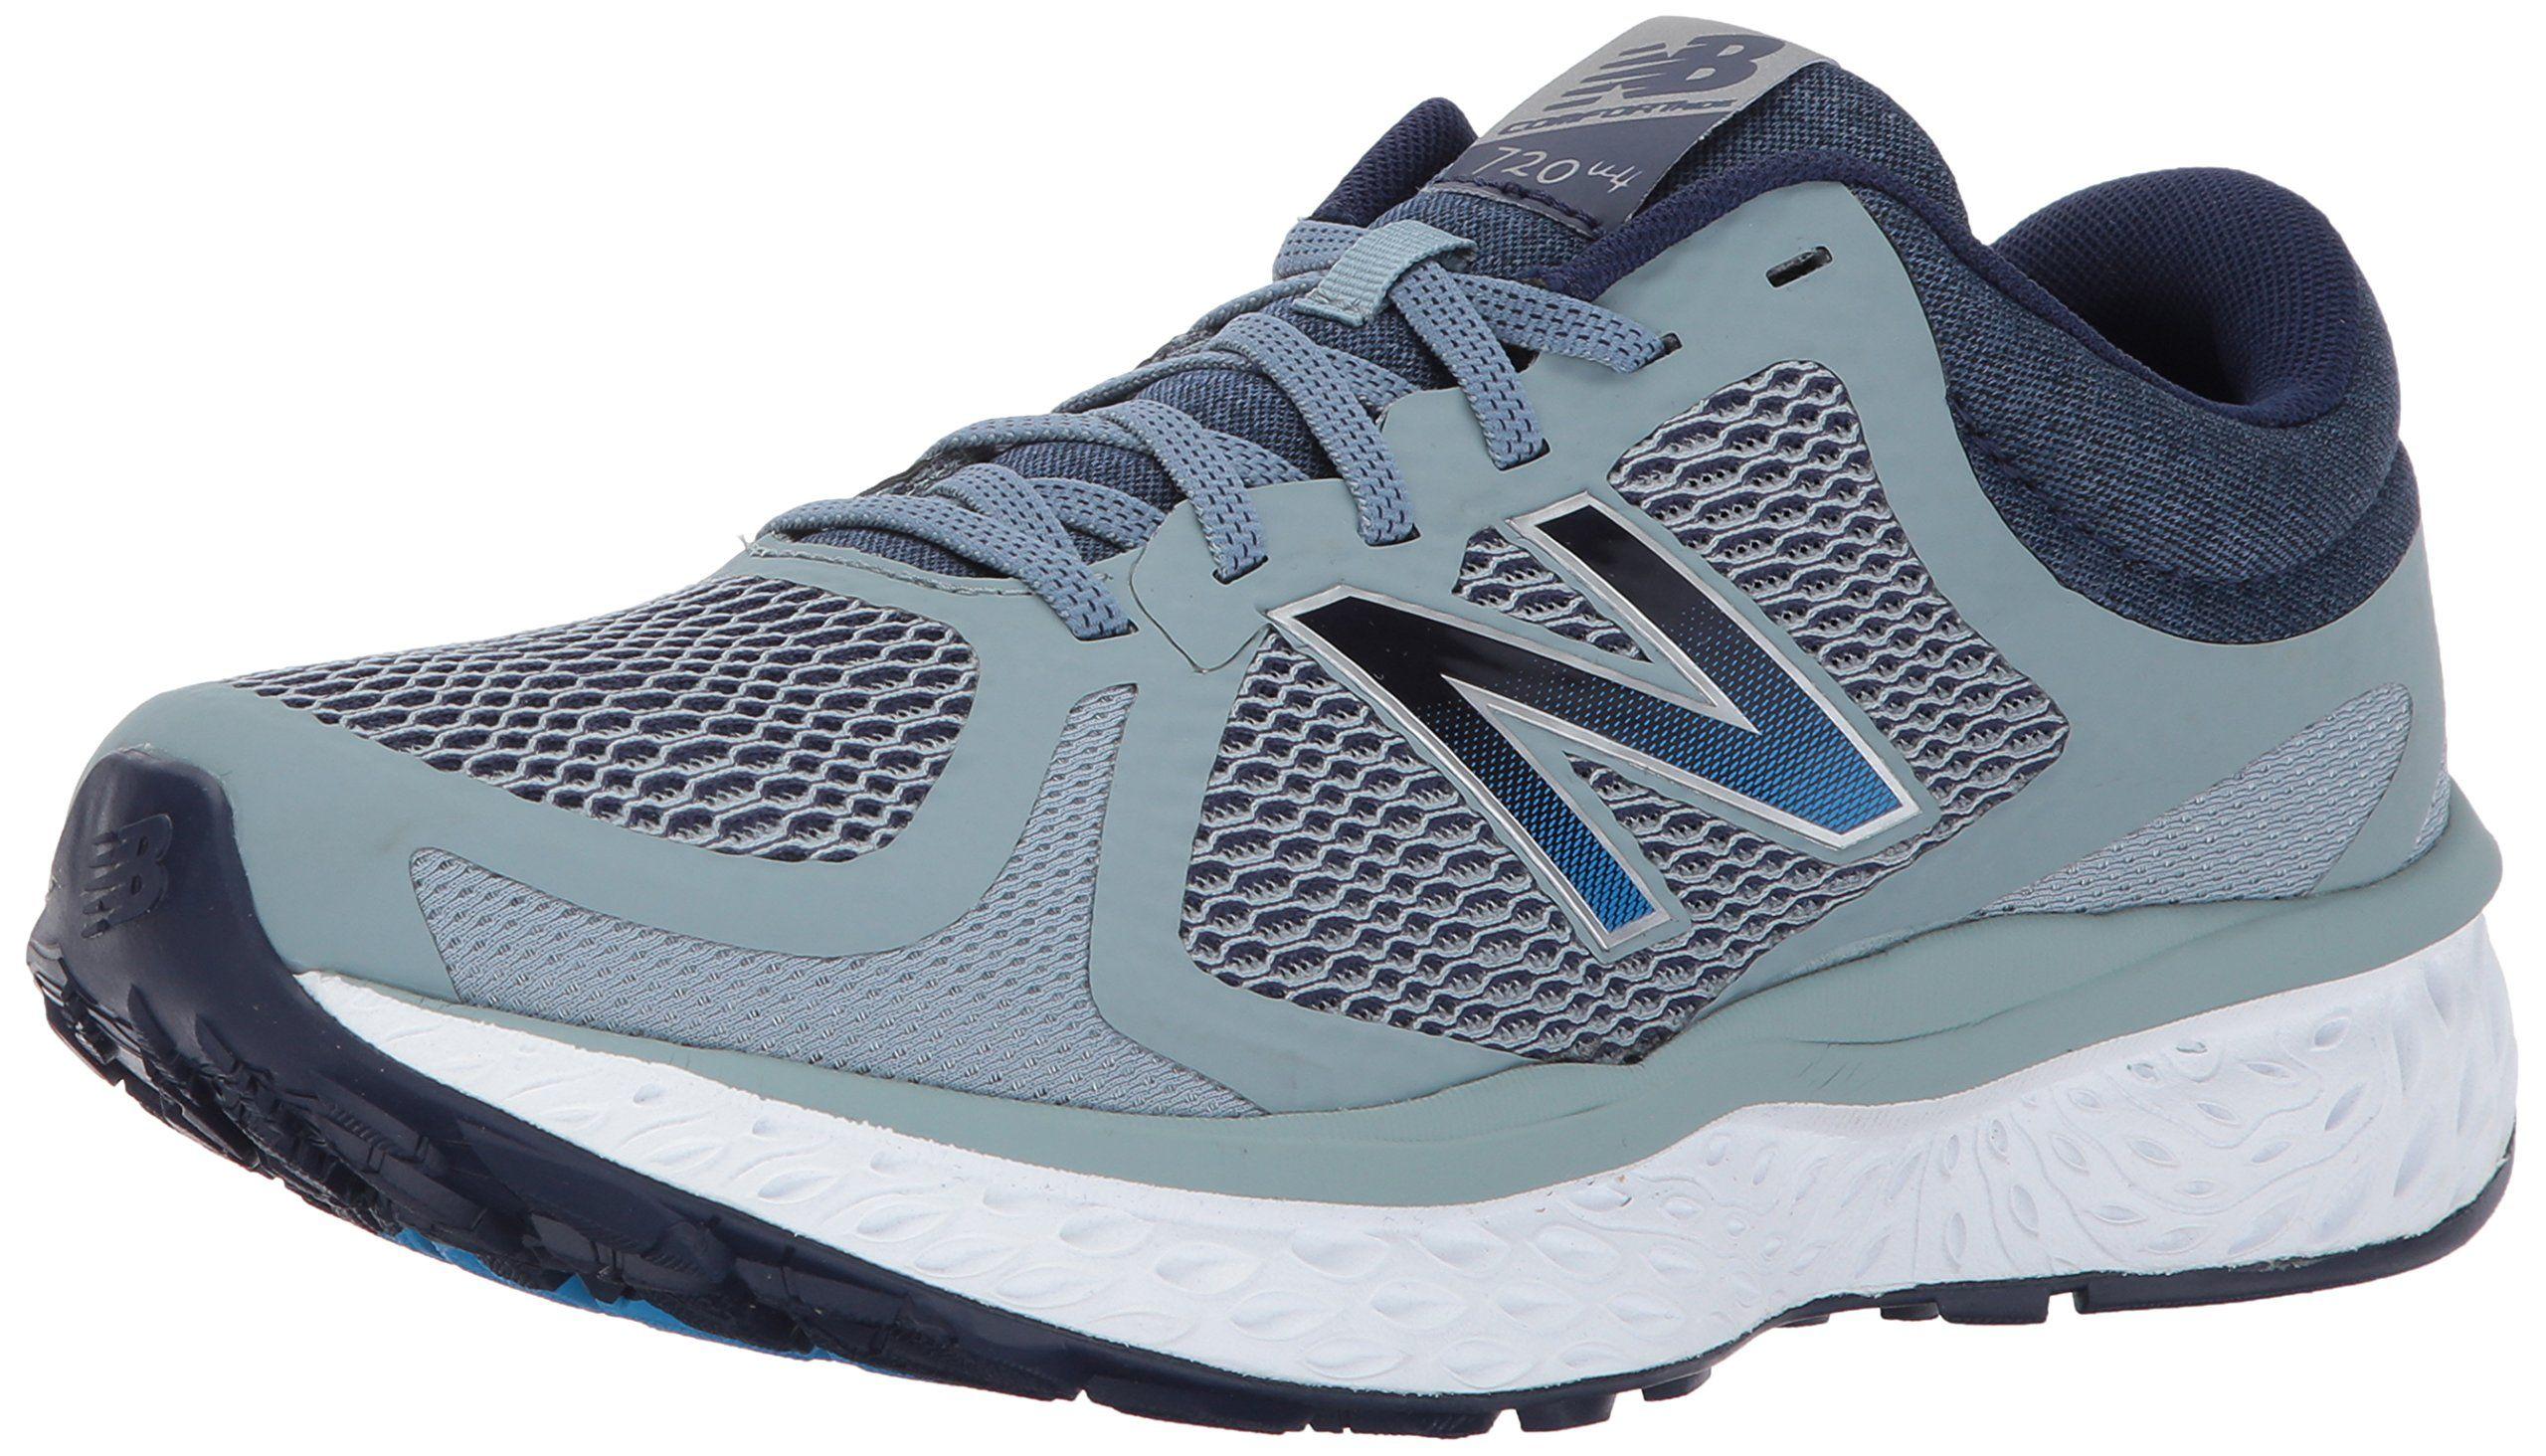 720v4 Running-Shoes. Running shoe